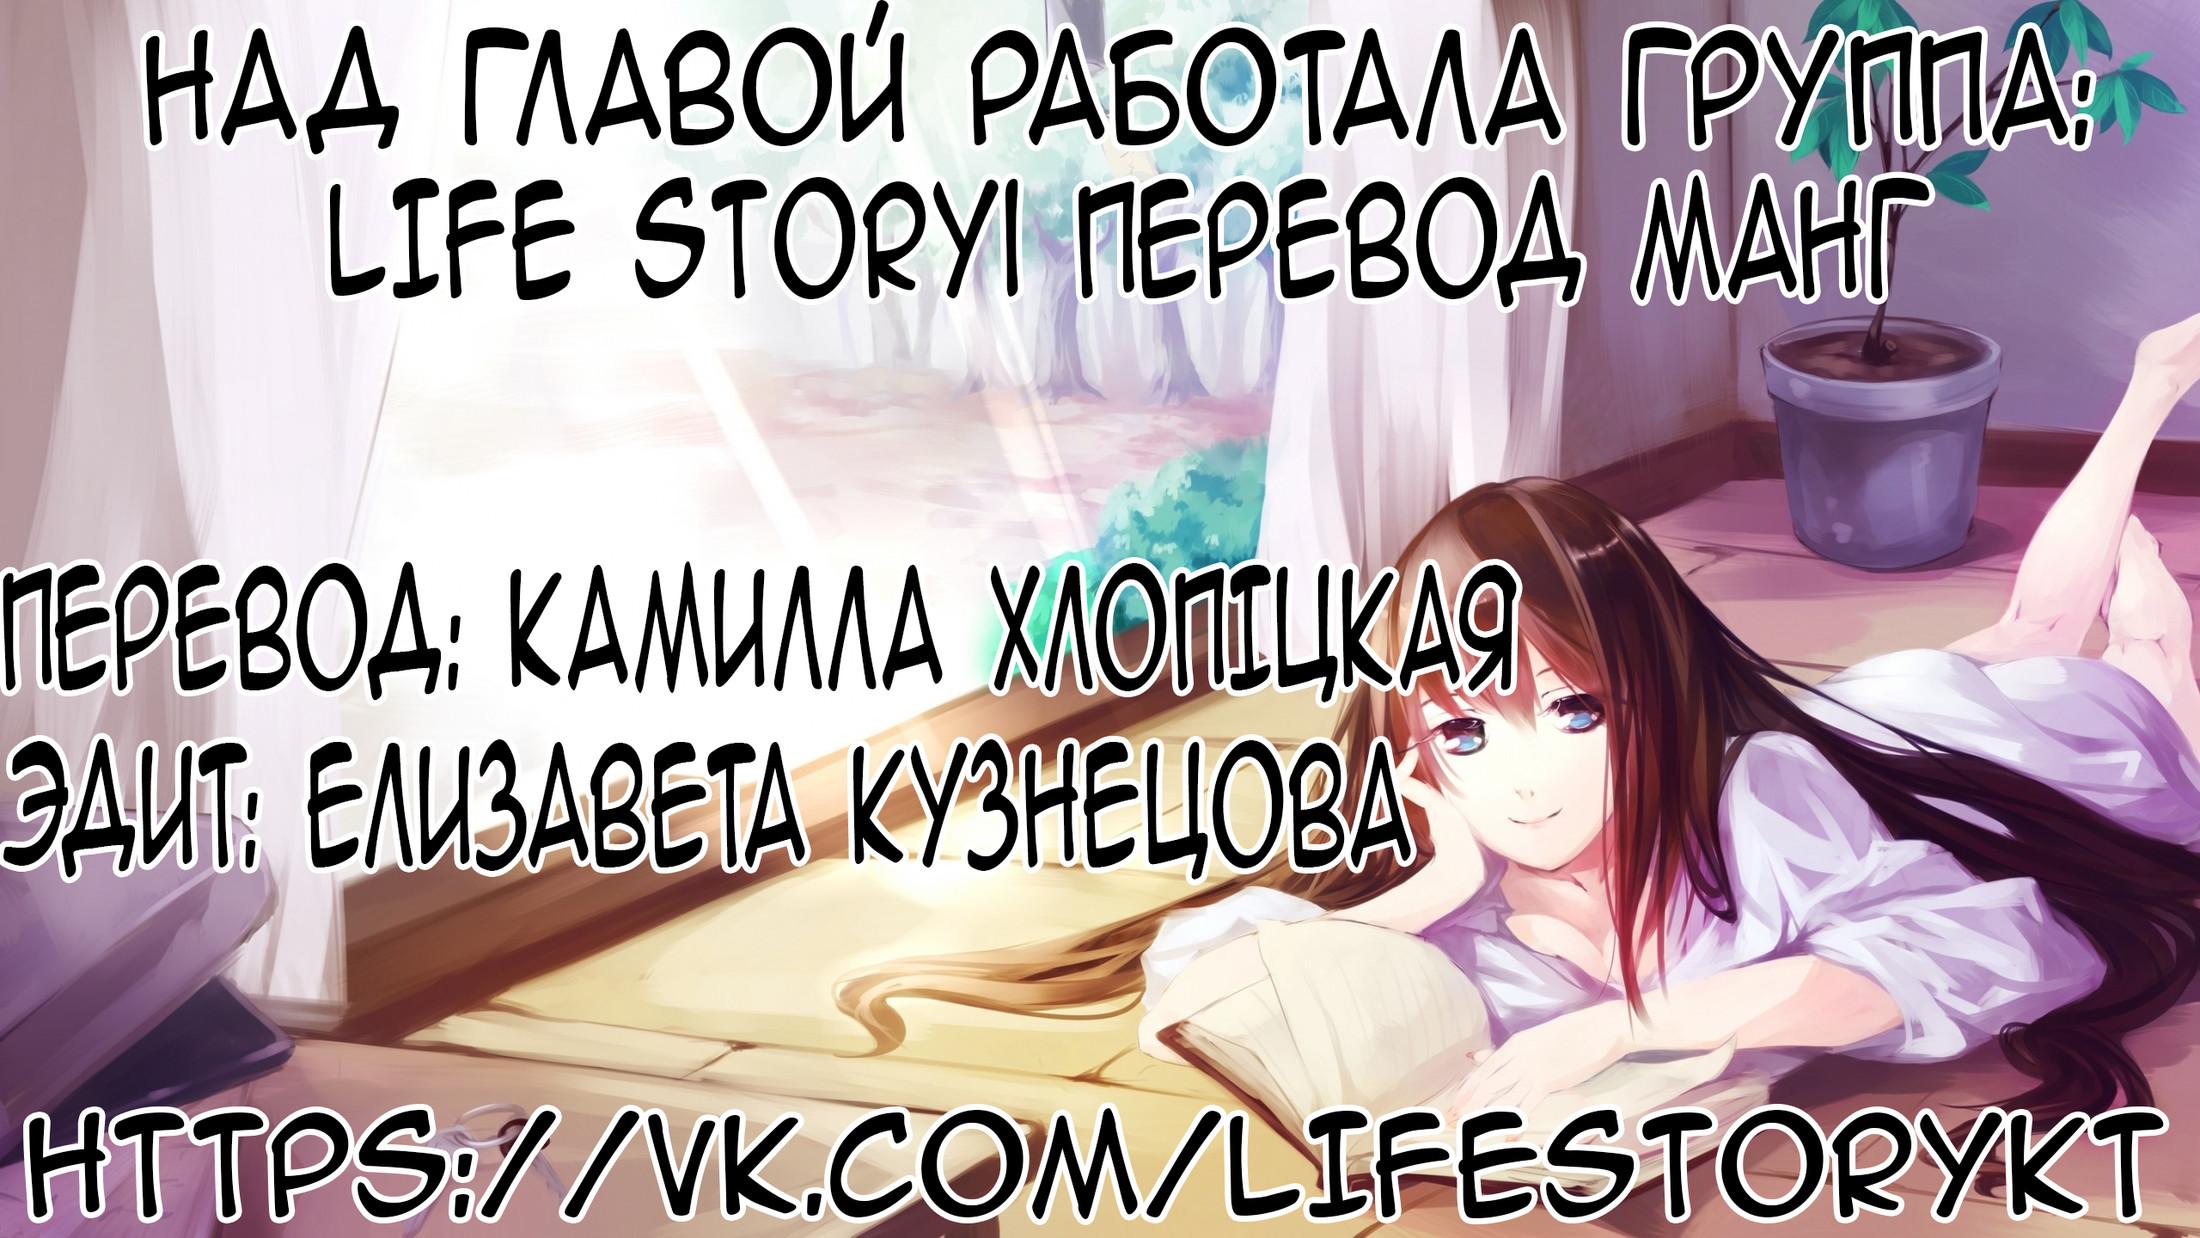 https://r2.ninemanga.com/comics/pic5/41/35753/1473740/1565177125800.jpg Page 2